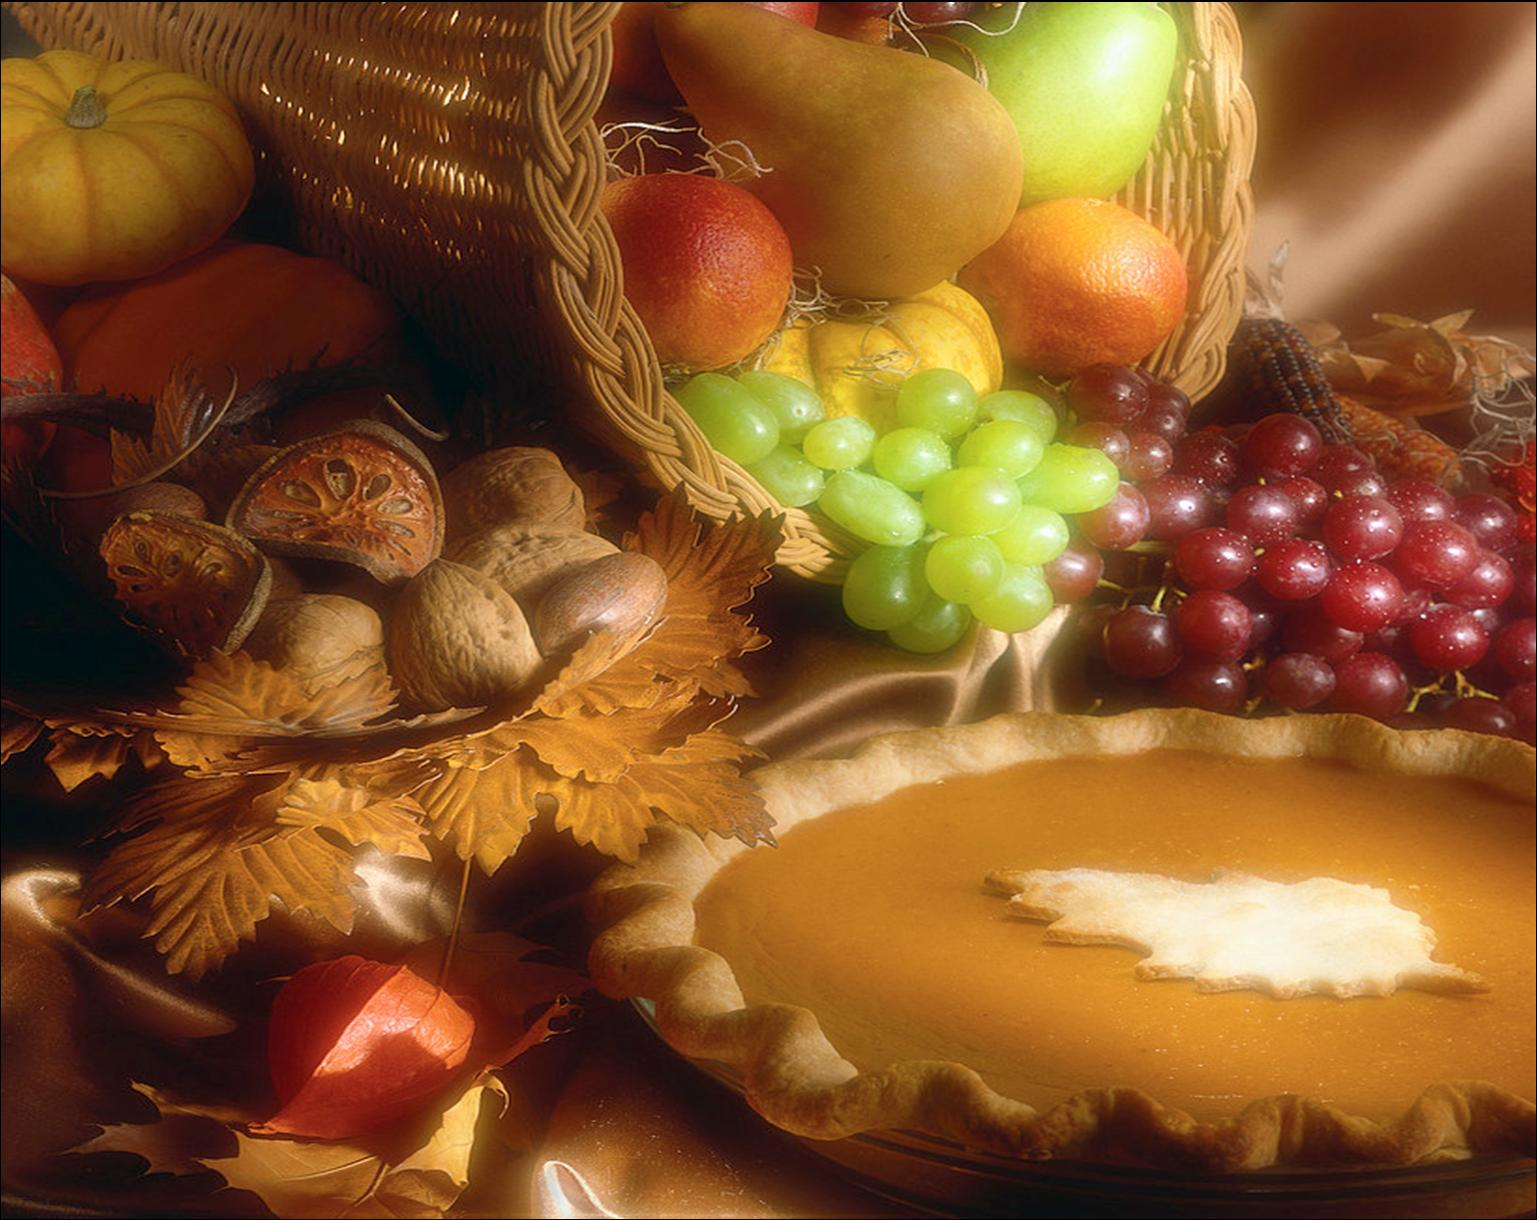 44 Precious Moments Thanksgiving Wallpaper On